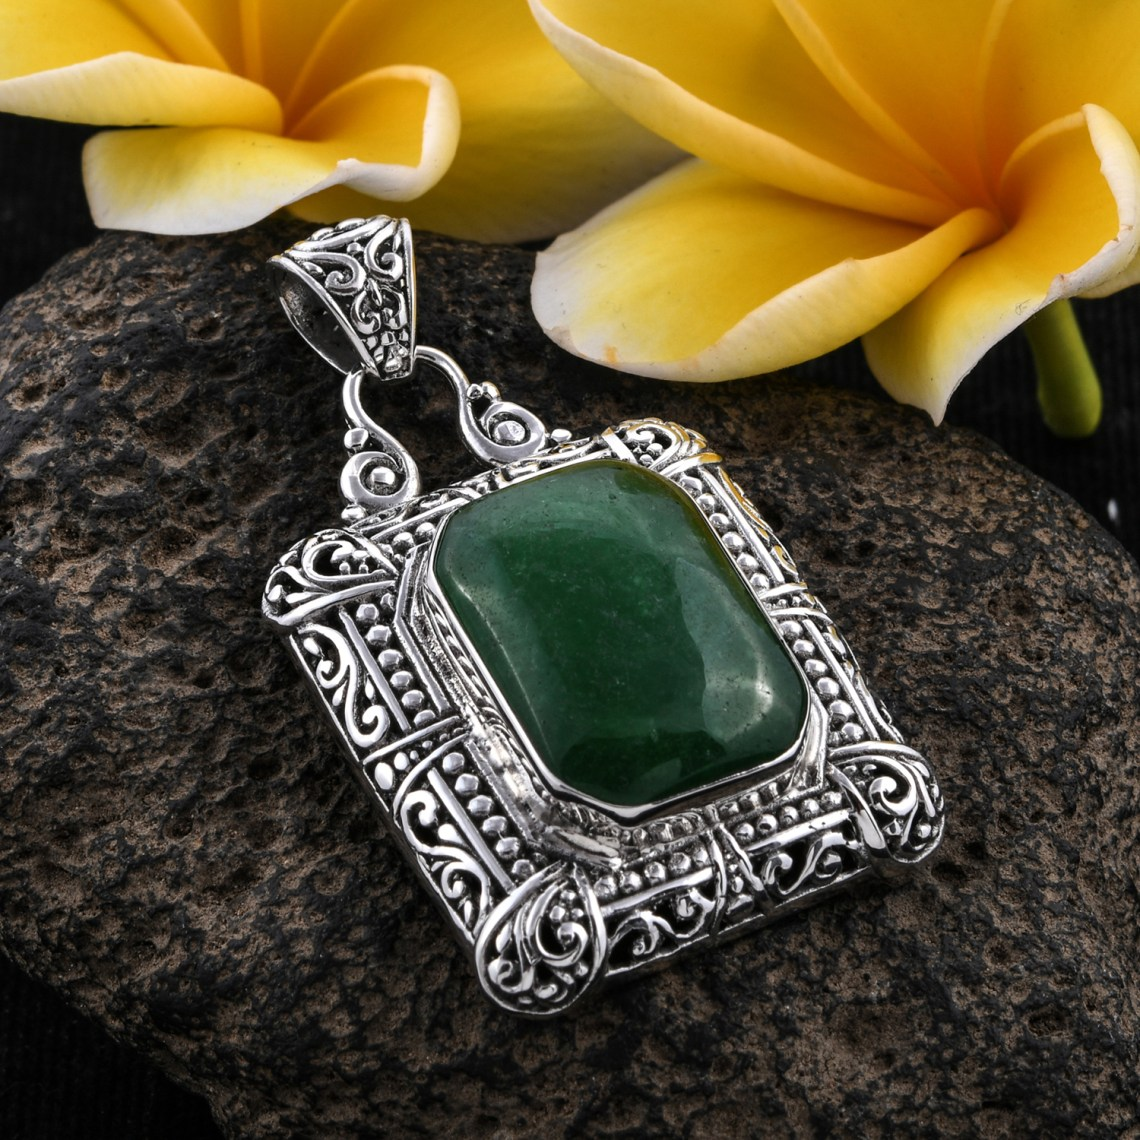 Bali crafted jade pendant on gray stone.